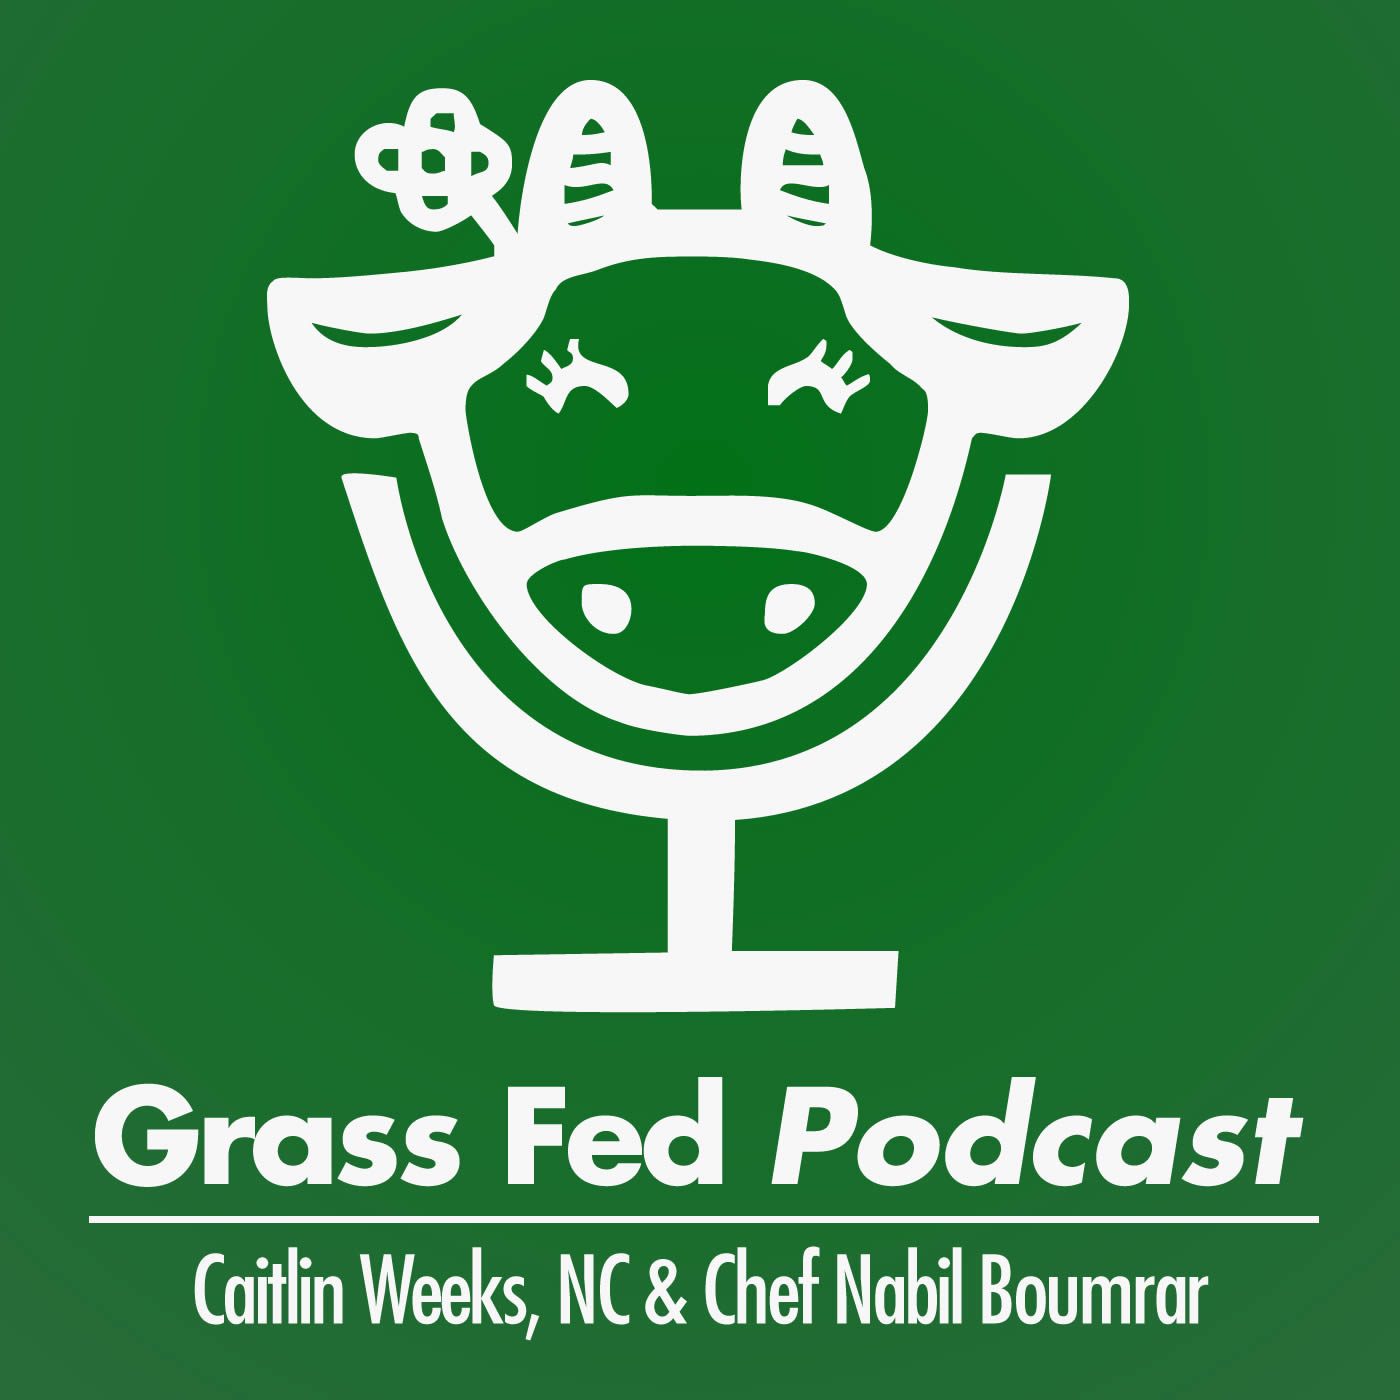 Grass Fed Podcast